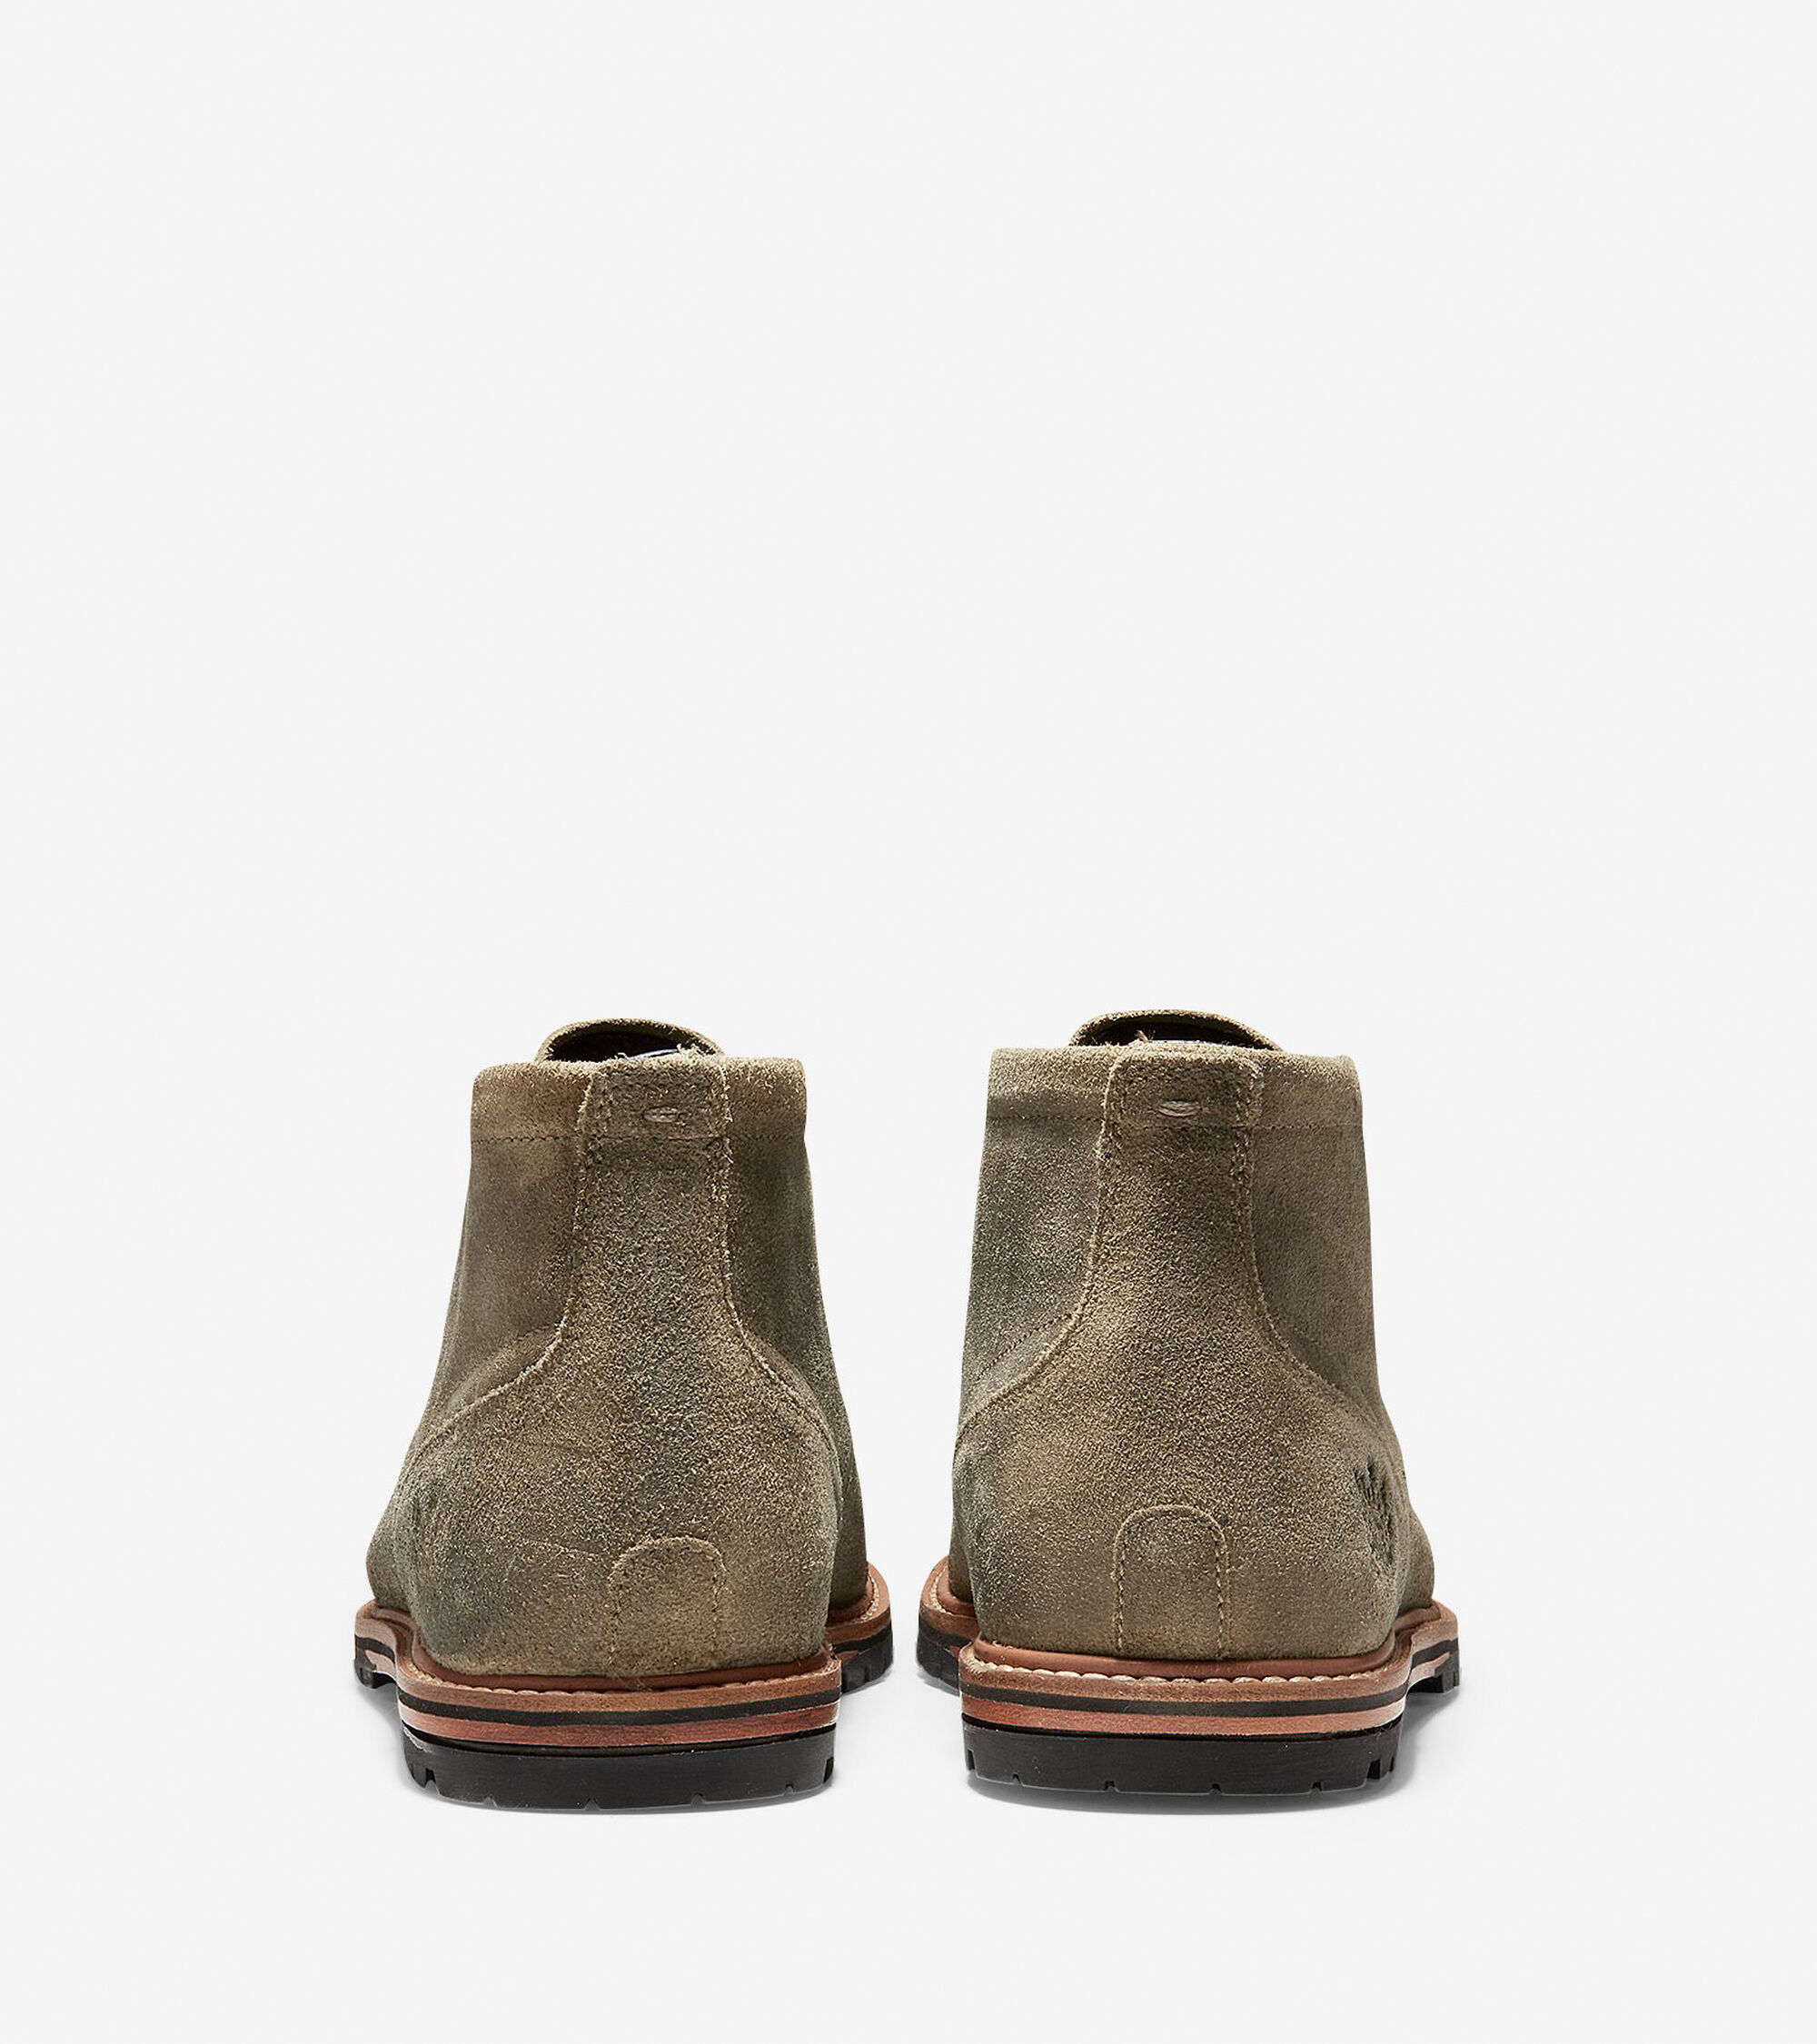 8721c8b2cbc Men's Raymond Grand Chukka Boots in Soft Sage | Cole Haan